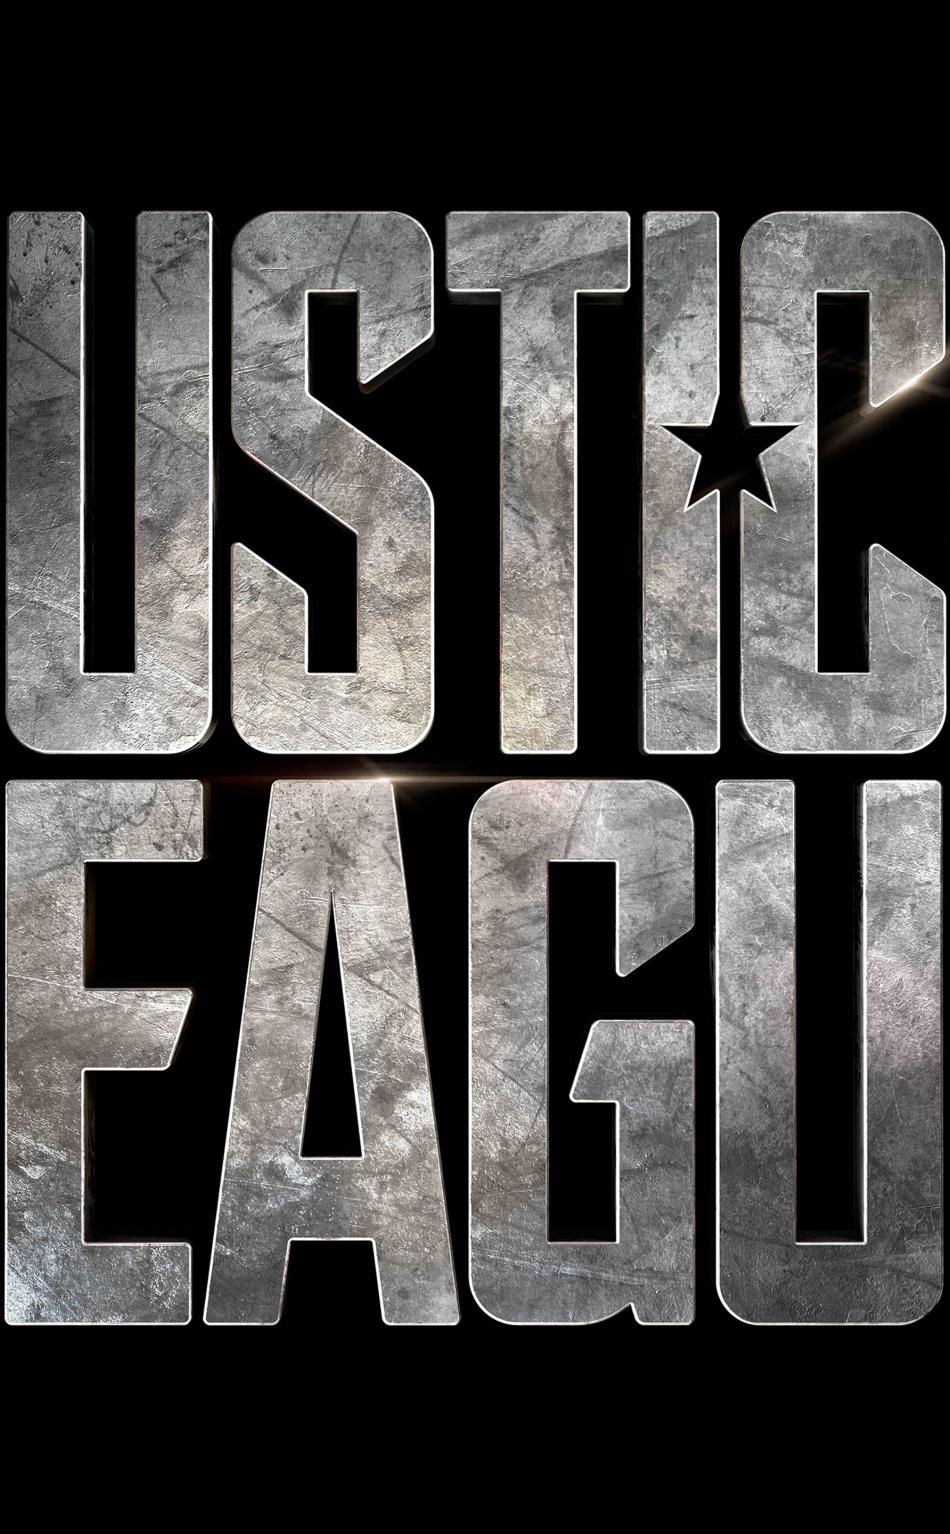 Beautiful Wallpaper Logo Justice League - justice-league-logo_59611_950x1534  Picture_477534.jpg